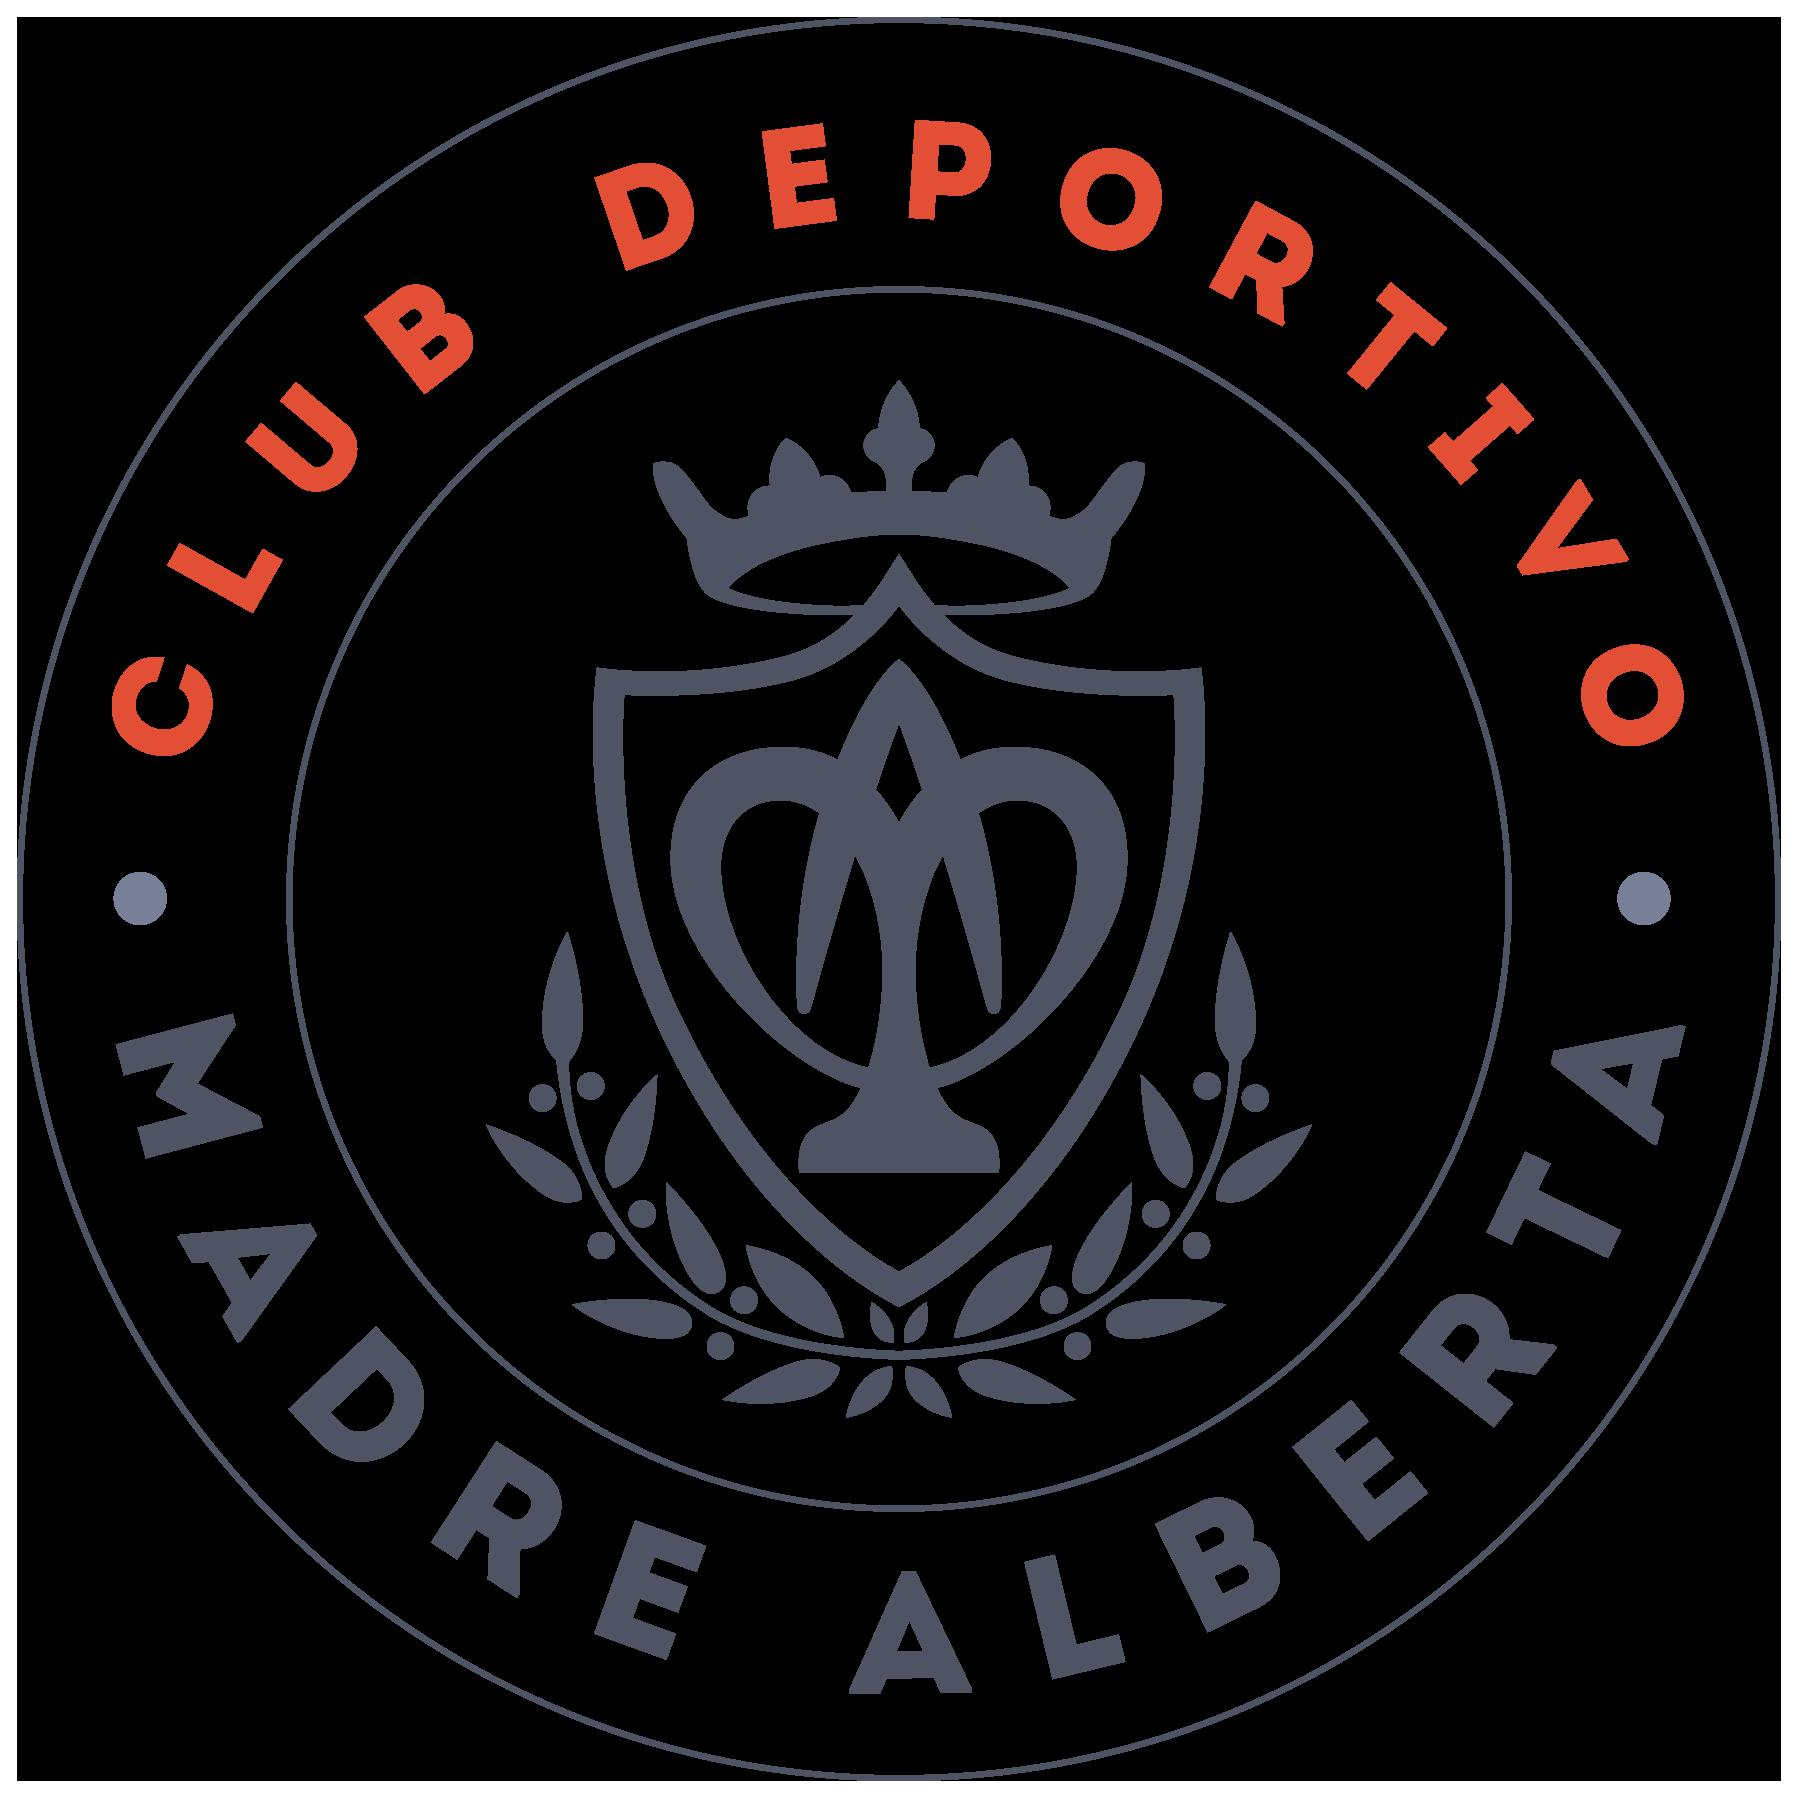 Club Deportivo Madre Alberta